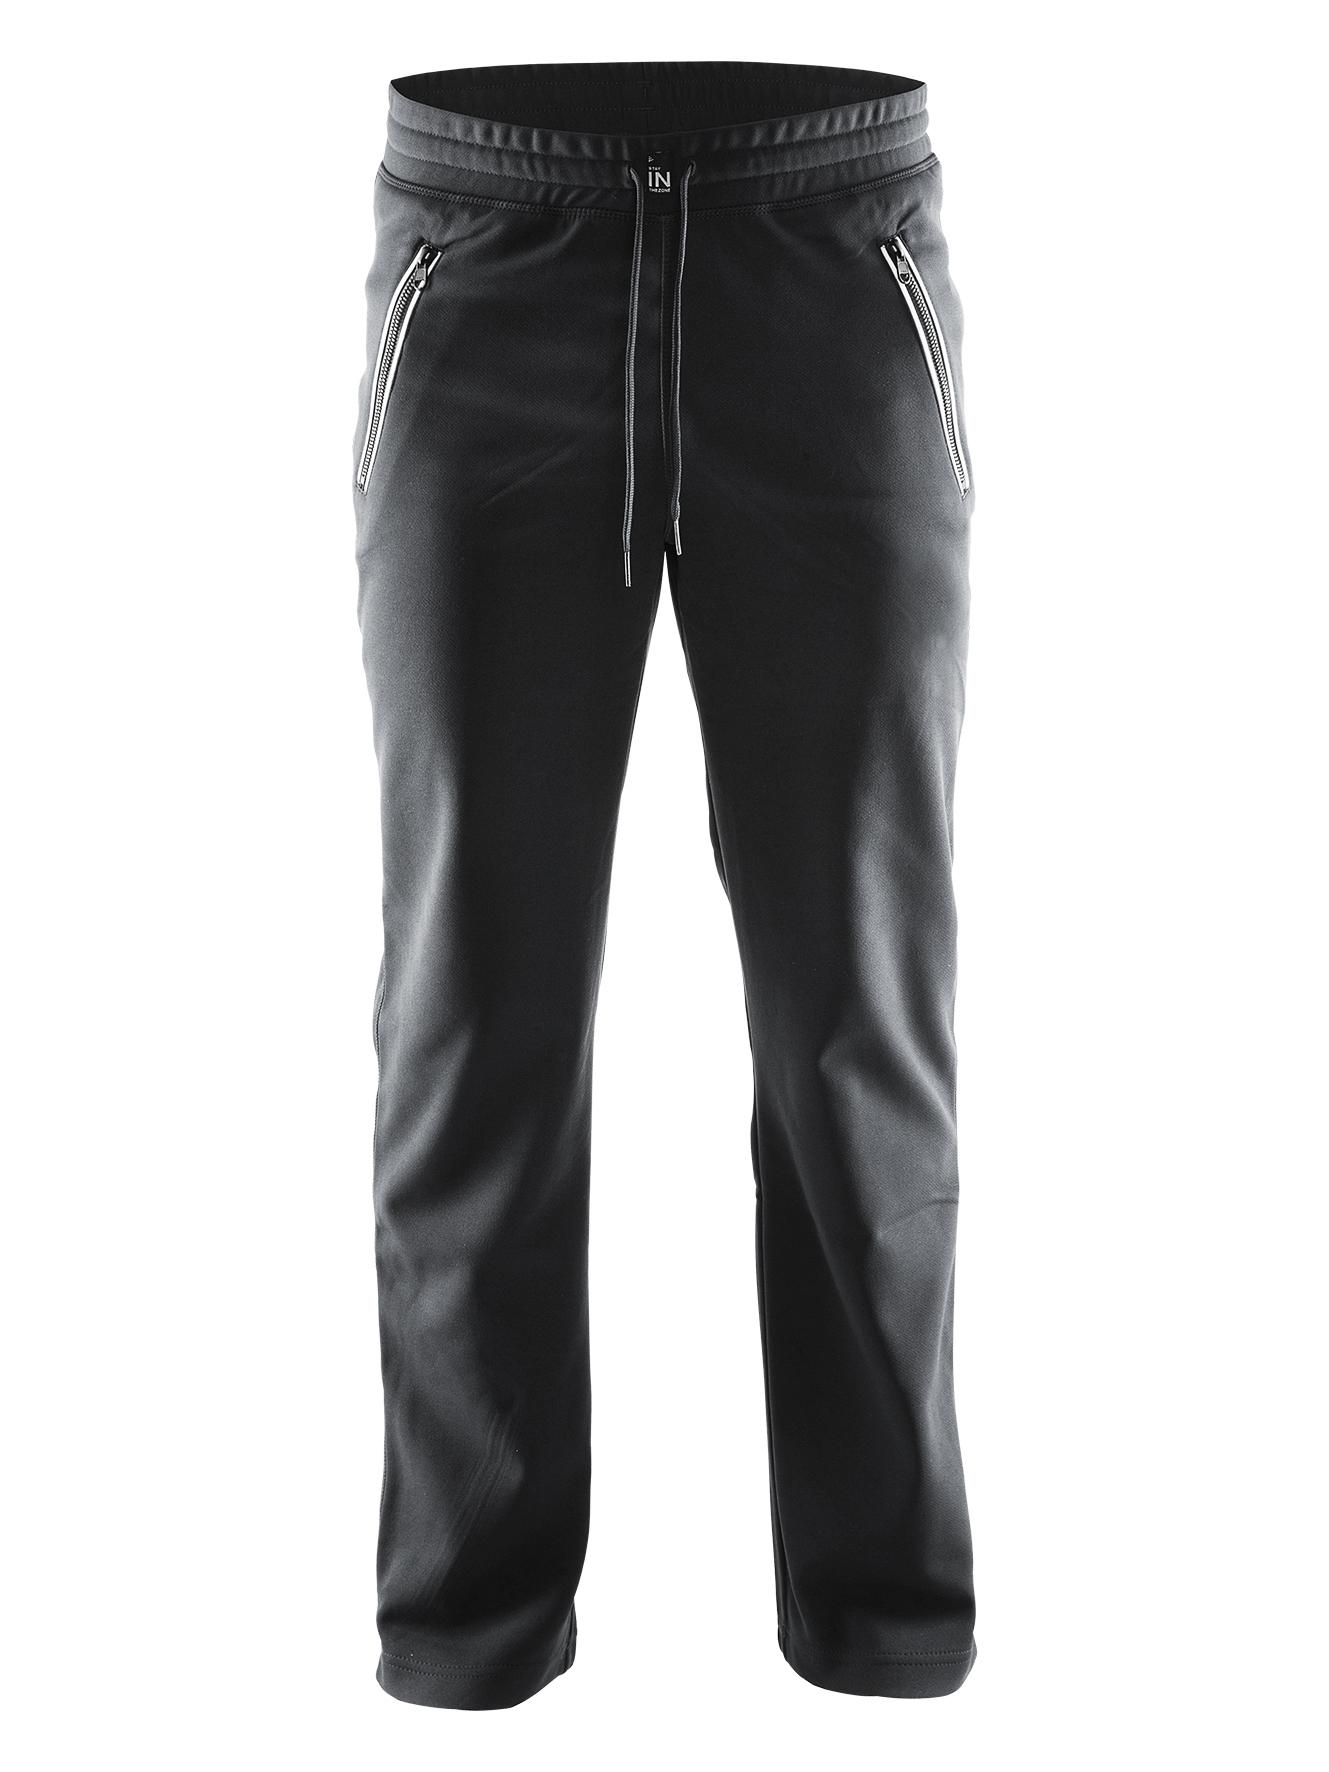 Мужские брюки Craft In The Zone черные (1902644-9900)